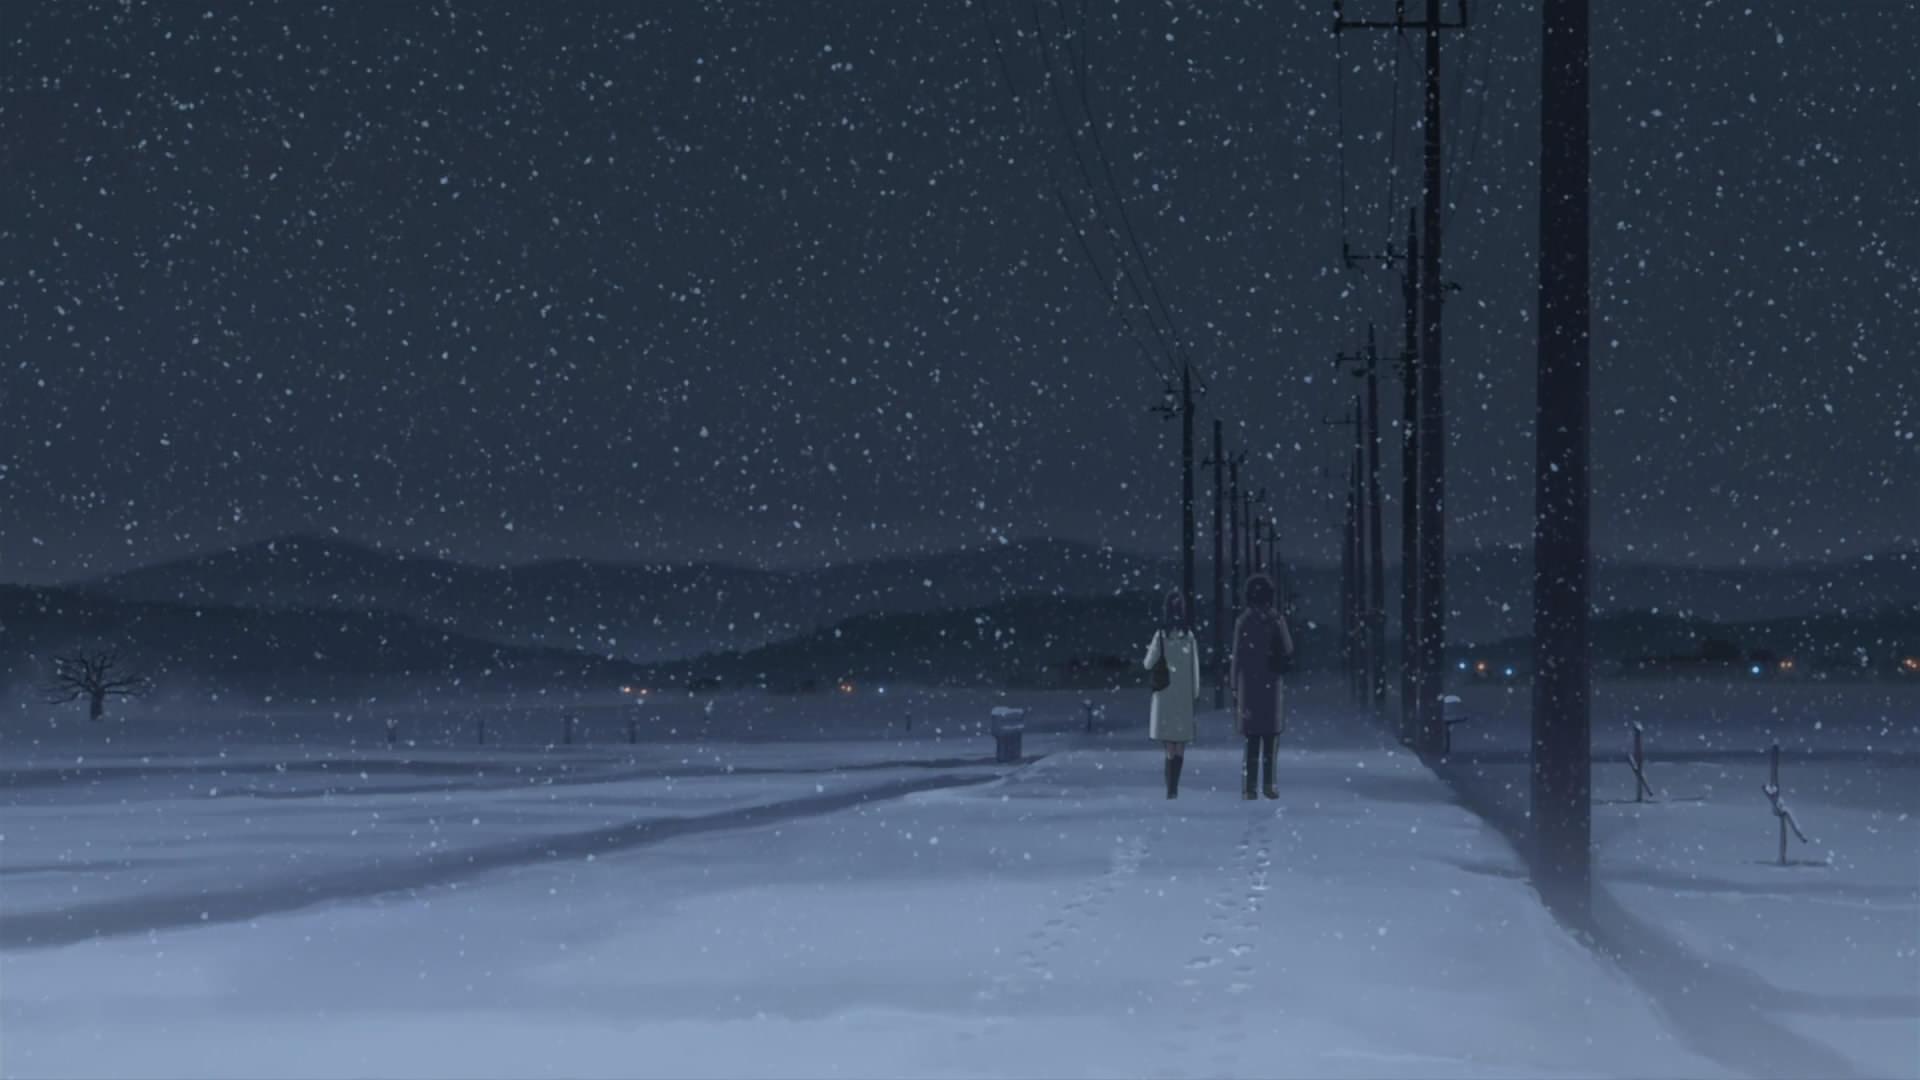 Snowfall Painting Image